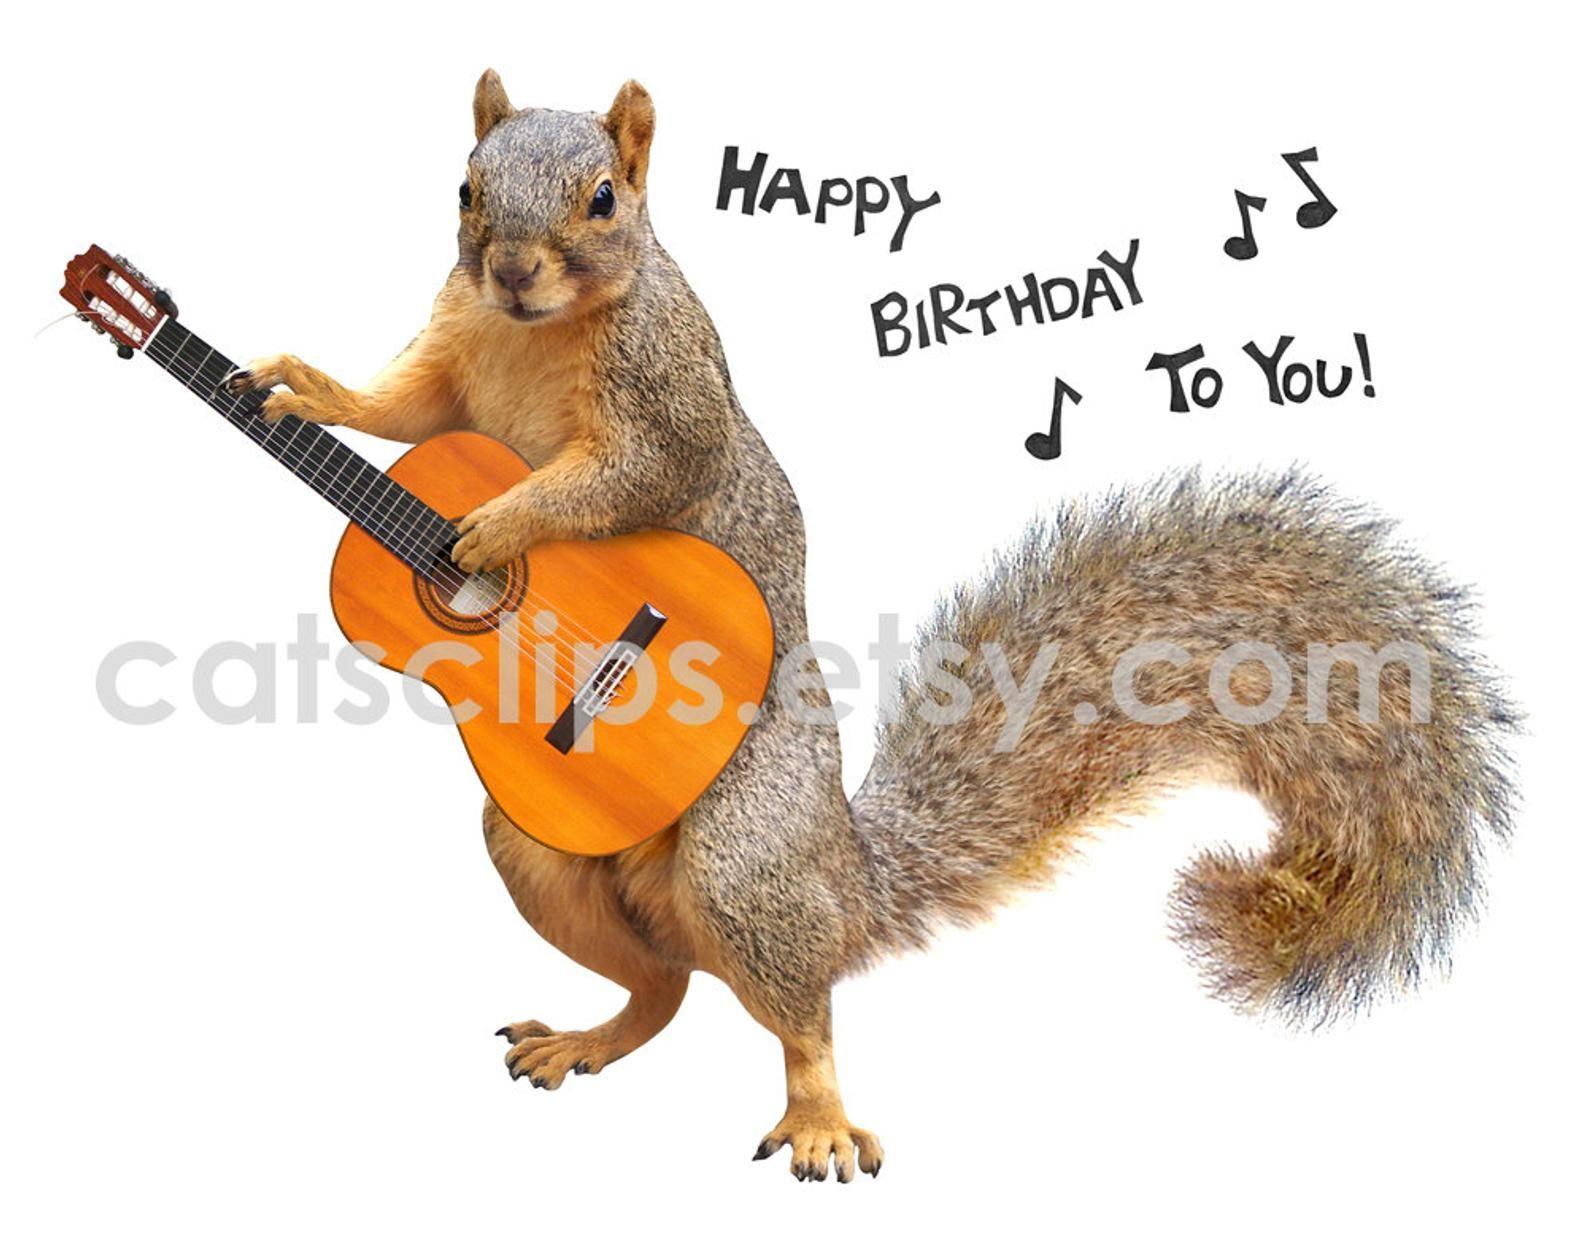 Squirrel Playing Guitar Happy Birthday Printable Birthday Card Happy Birthday Wishes Cards Happy Birthday Guitar Funny Happy Birthday Pictures